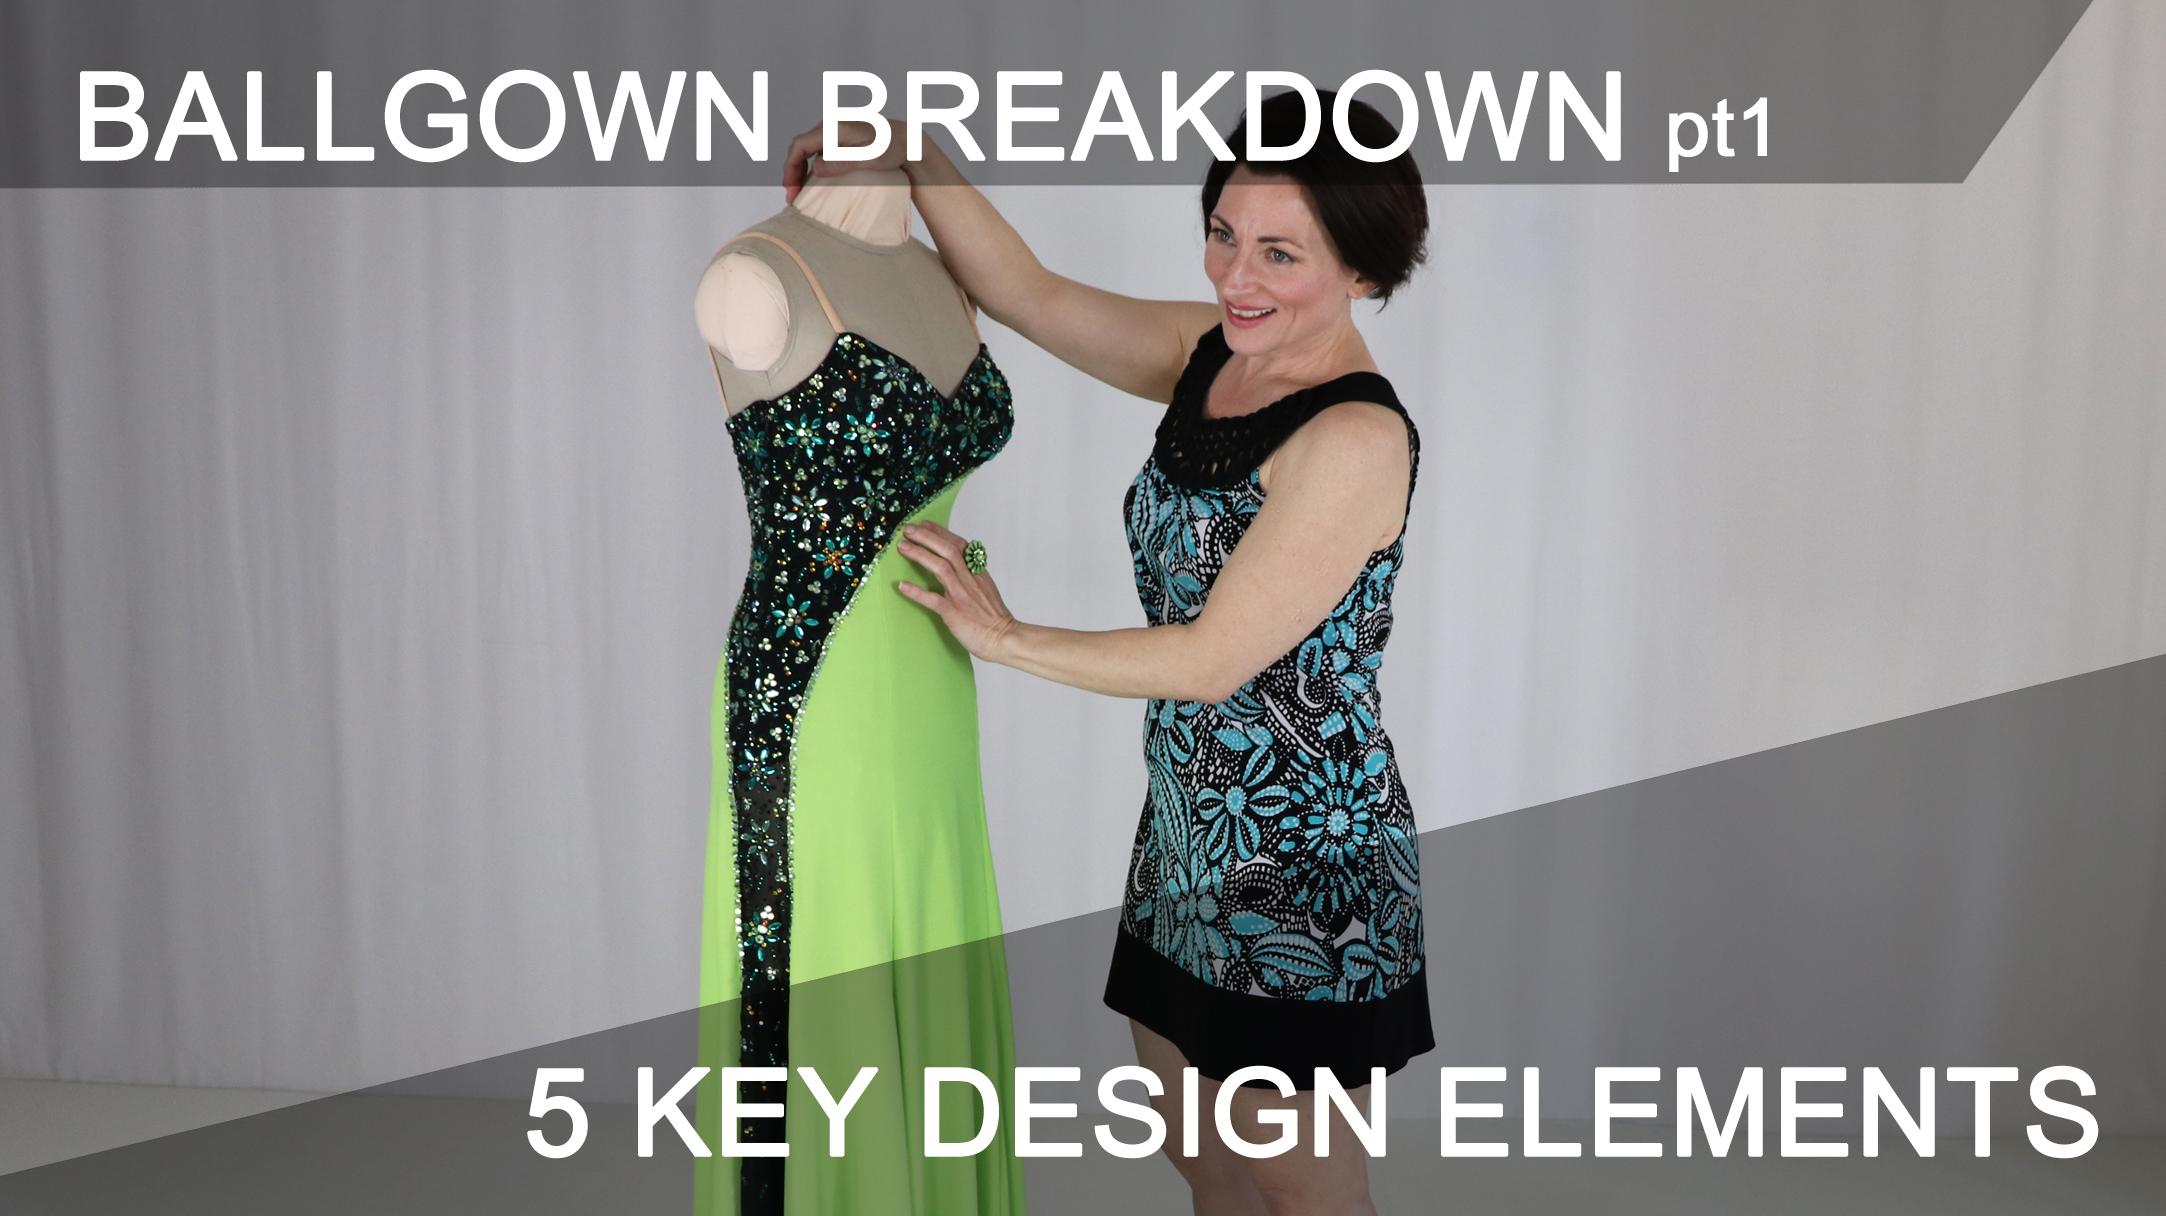 Strong Design Elements Make A Ballgown Shine